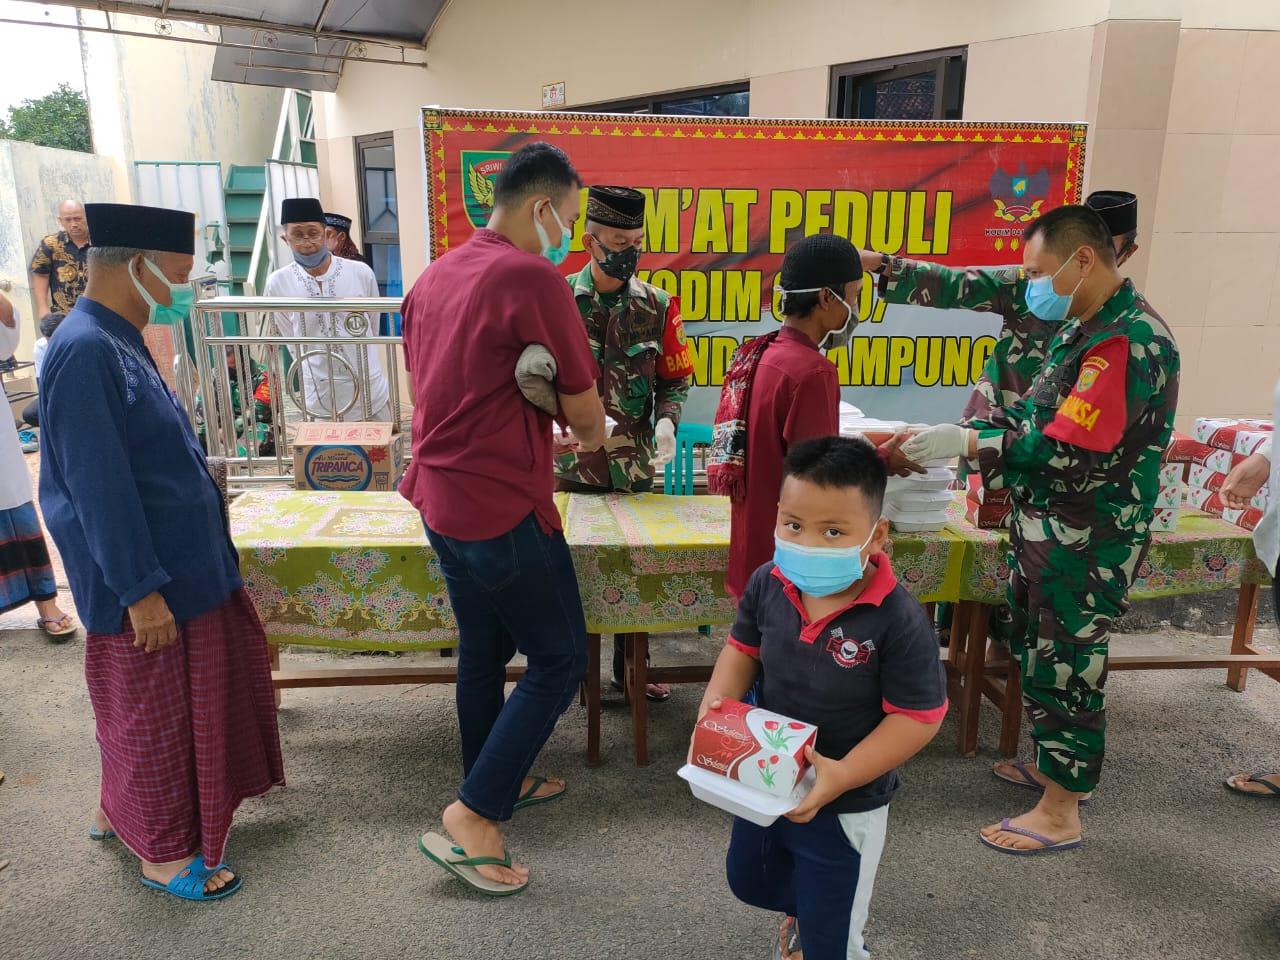 Kodim 0410/KBL menggelar kegiatan Jum'at peduli bertempat di Masjid Muttaqin, Kedamaian Kota Bandar Lampung